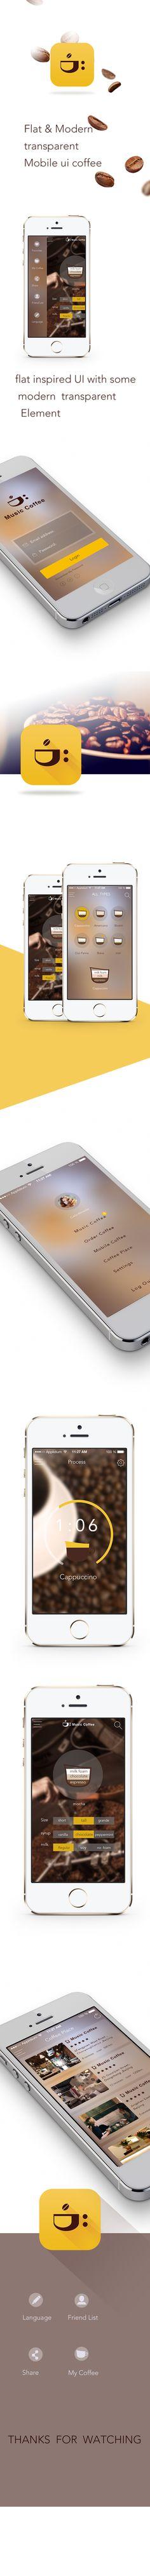 Flat & Modern transparent Mobile ui coffee by alina fu, via Behance